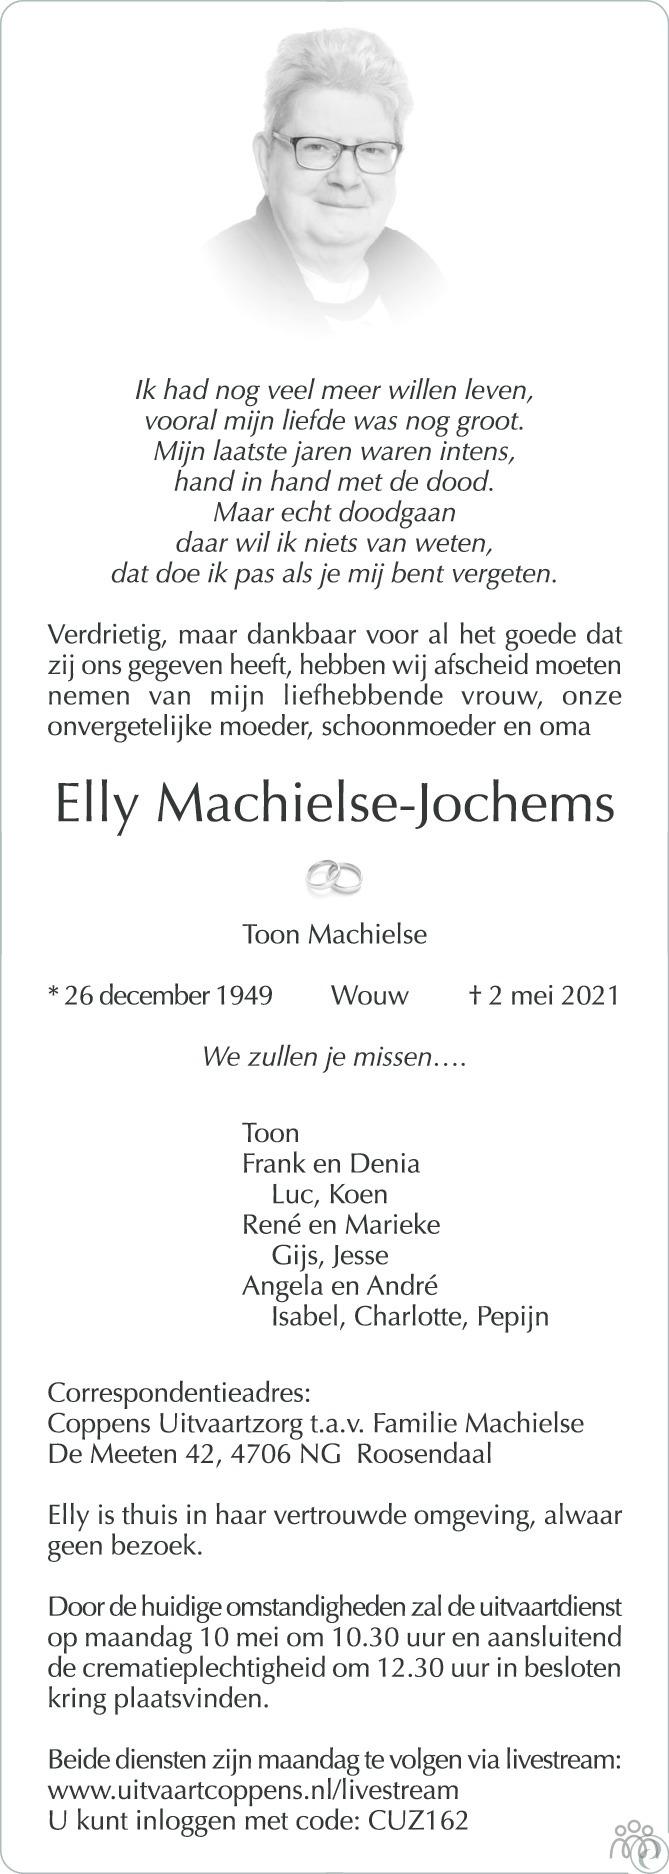 Overlijdensbericht van Elly Machielse-Jochems in BN DeStem